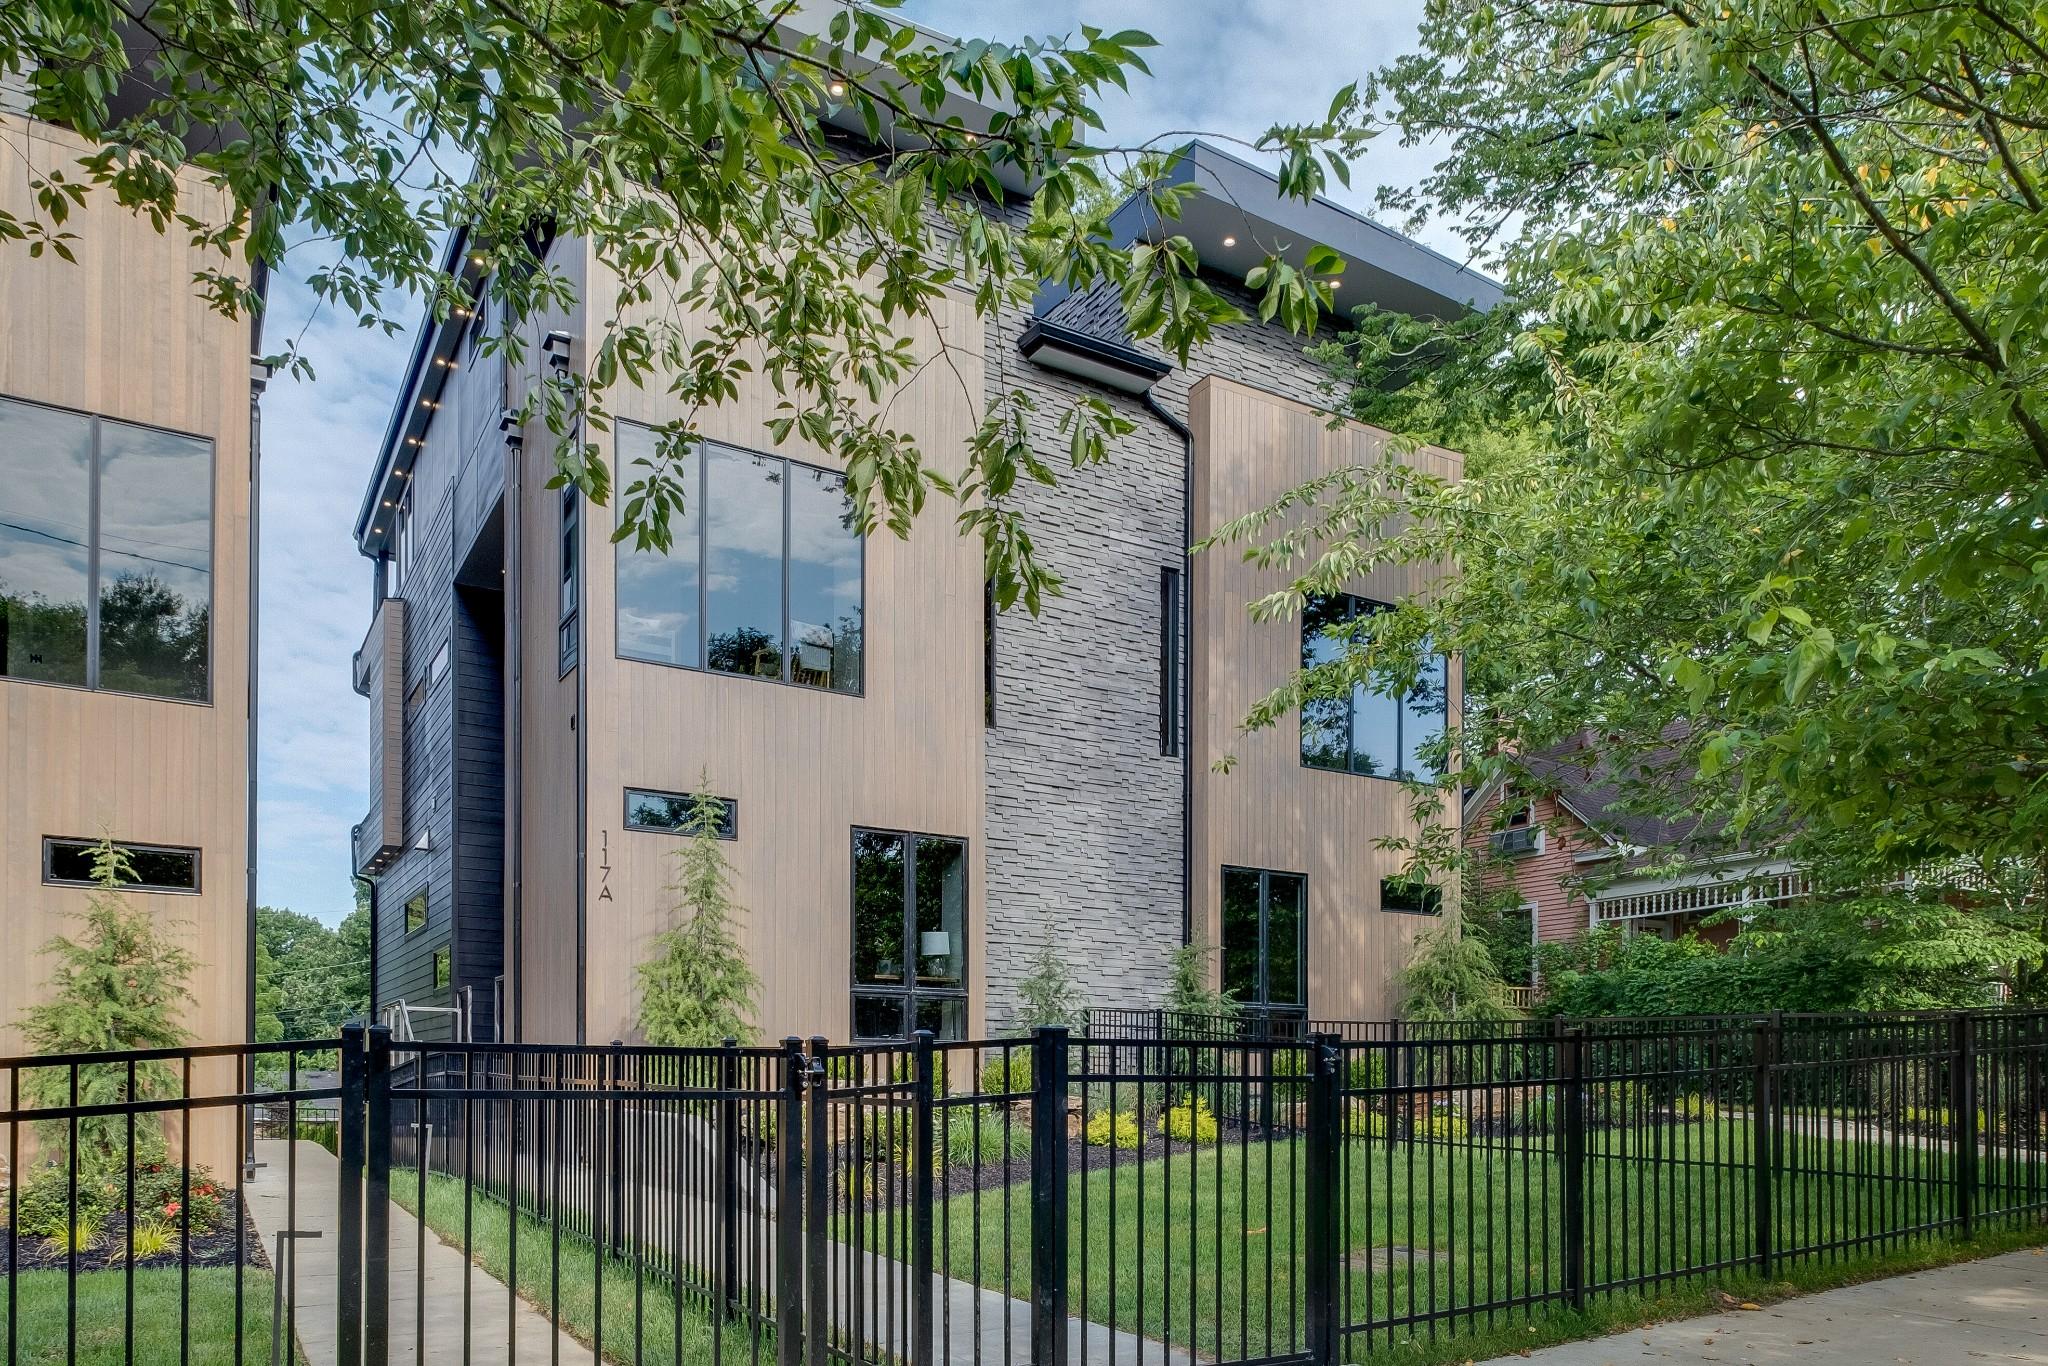 115B 46th Ave N Property Photo - Nashville, TN real estate listing